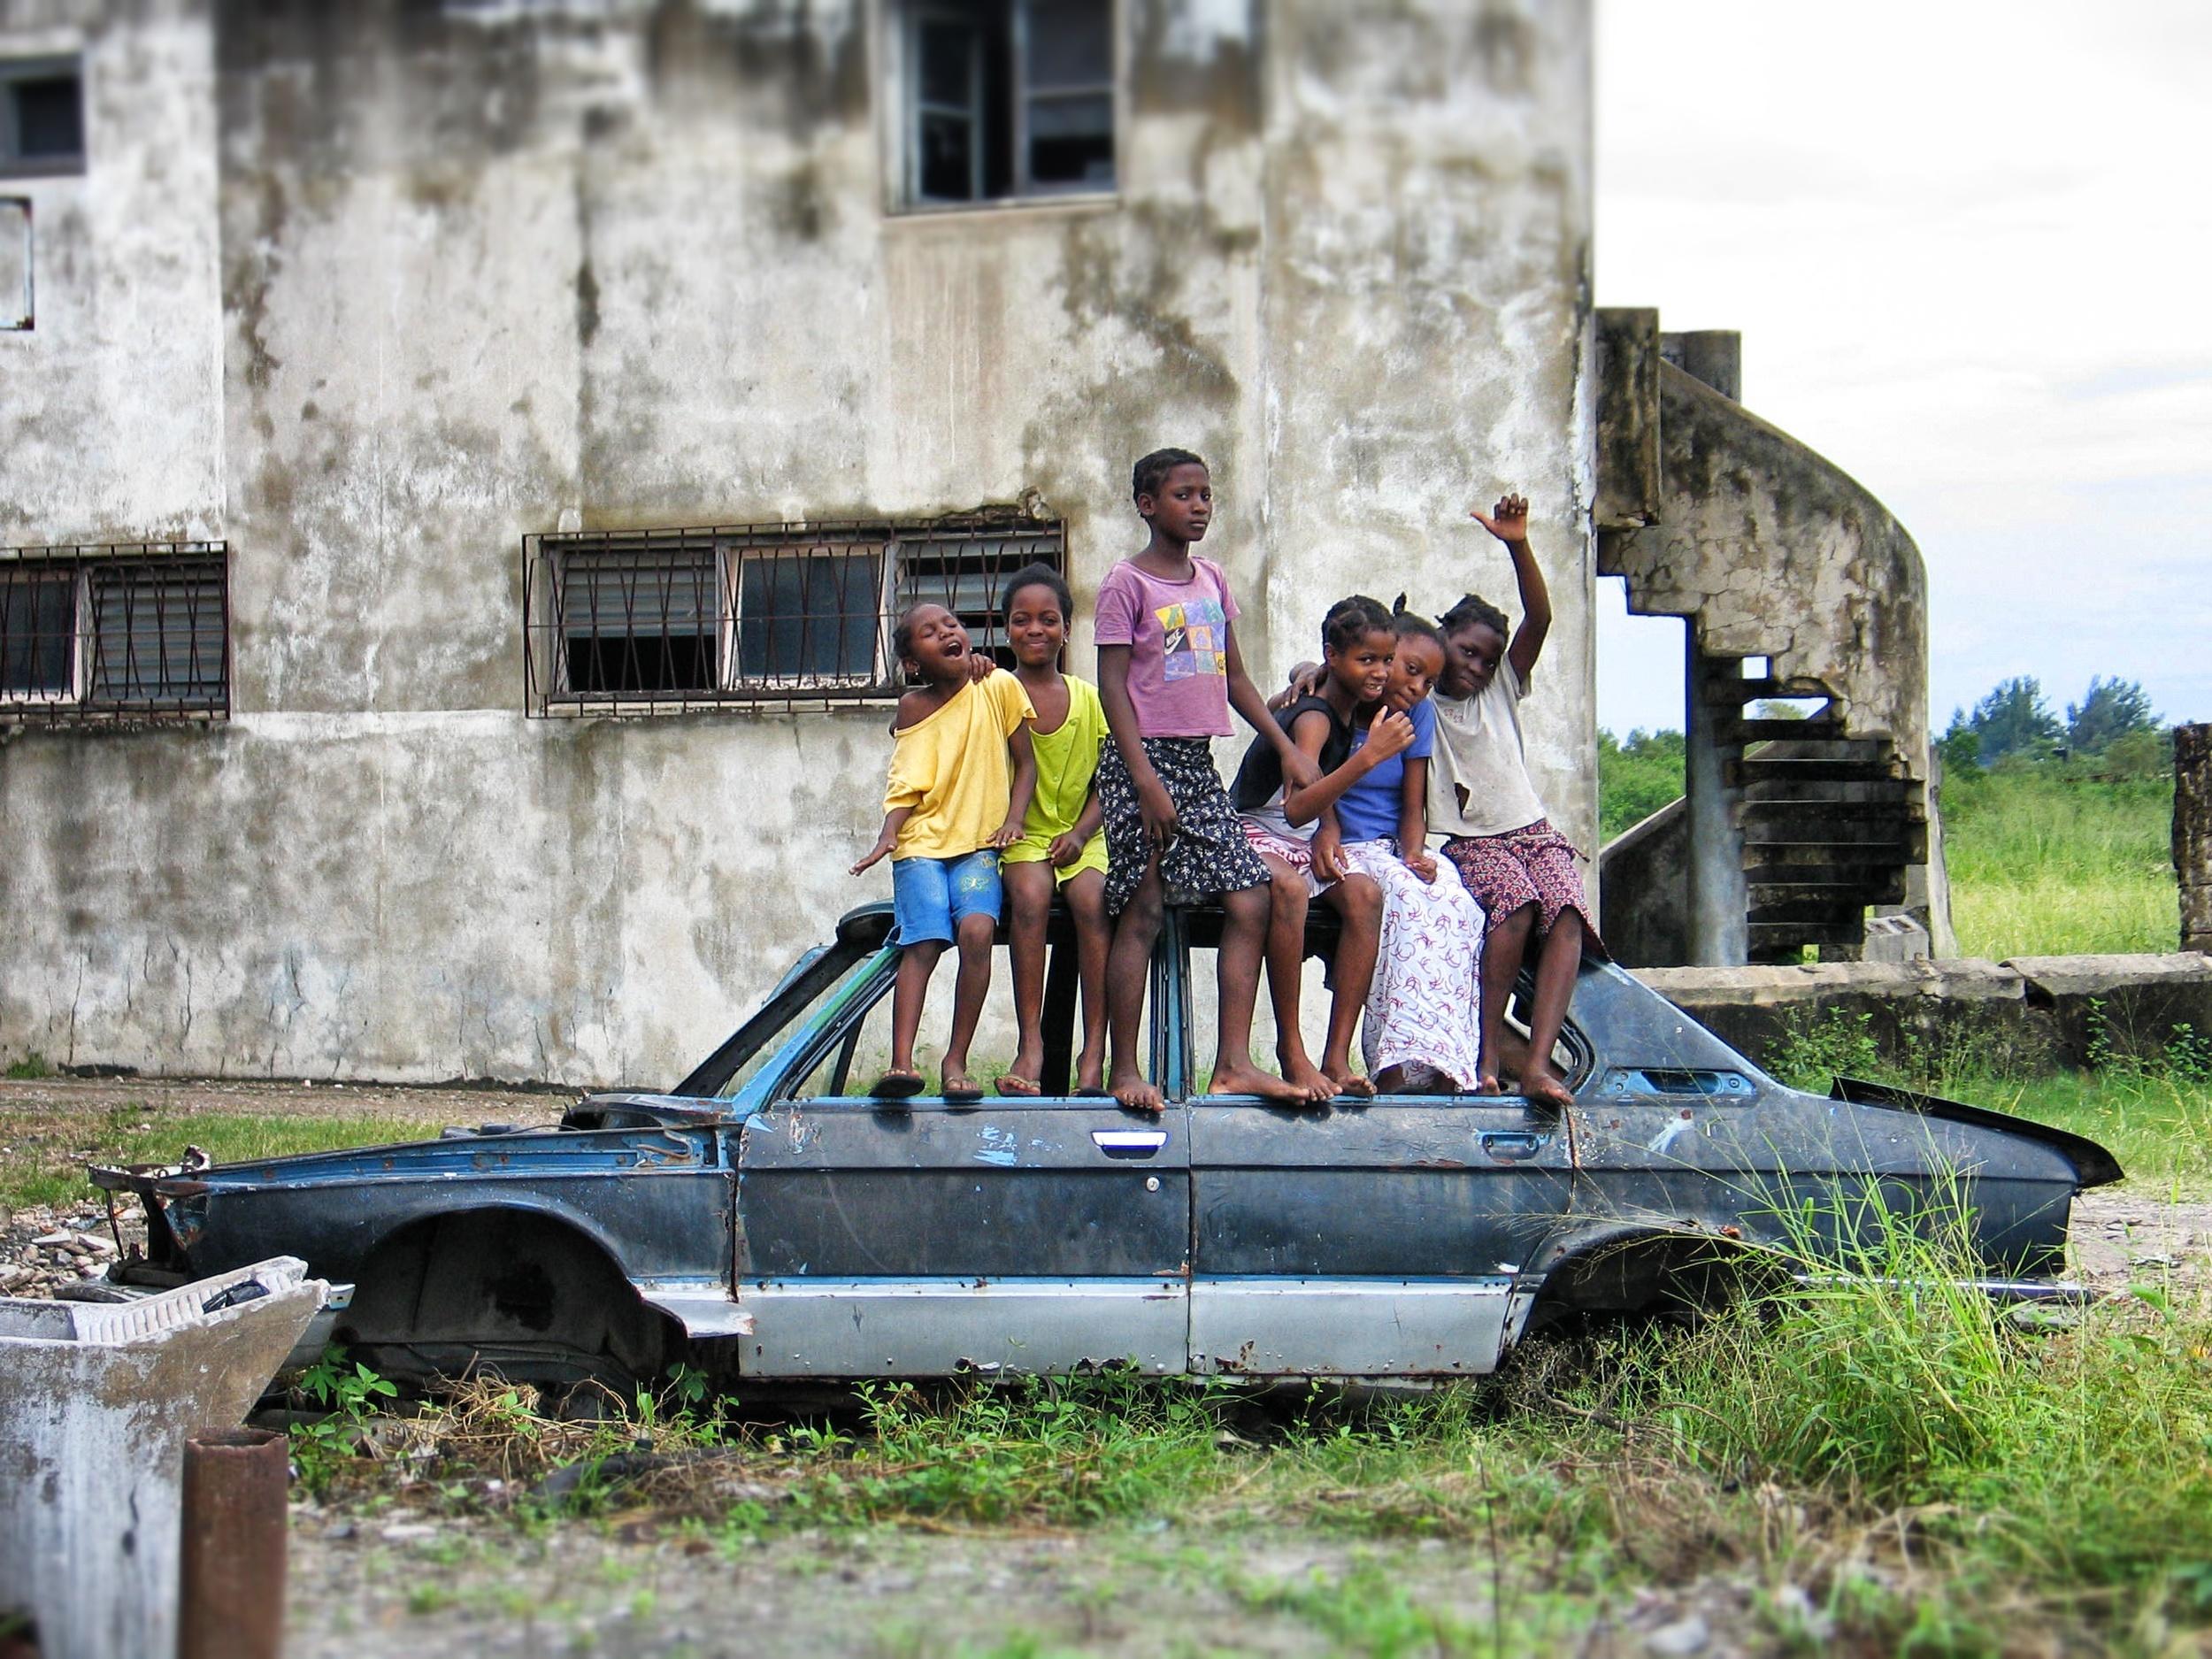 Back blocks, Beira, Mozambique_Snapseed.jpg